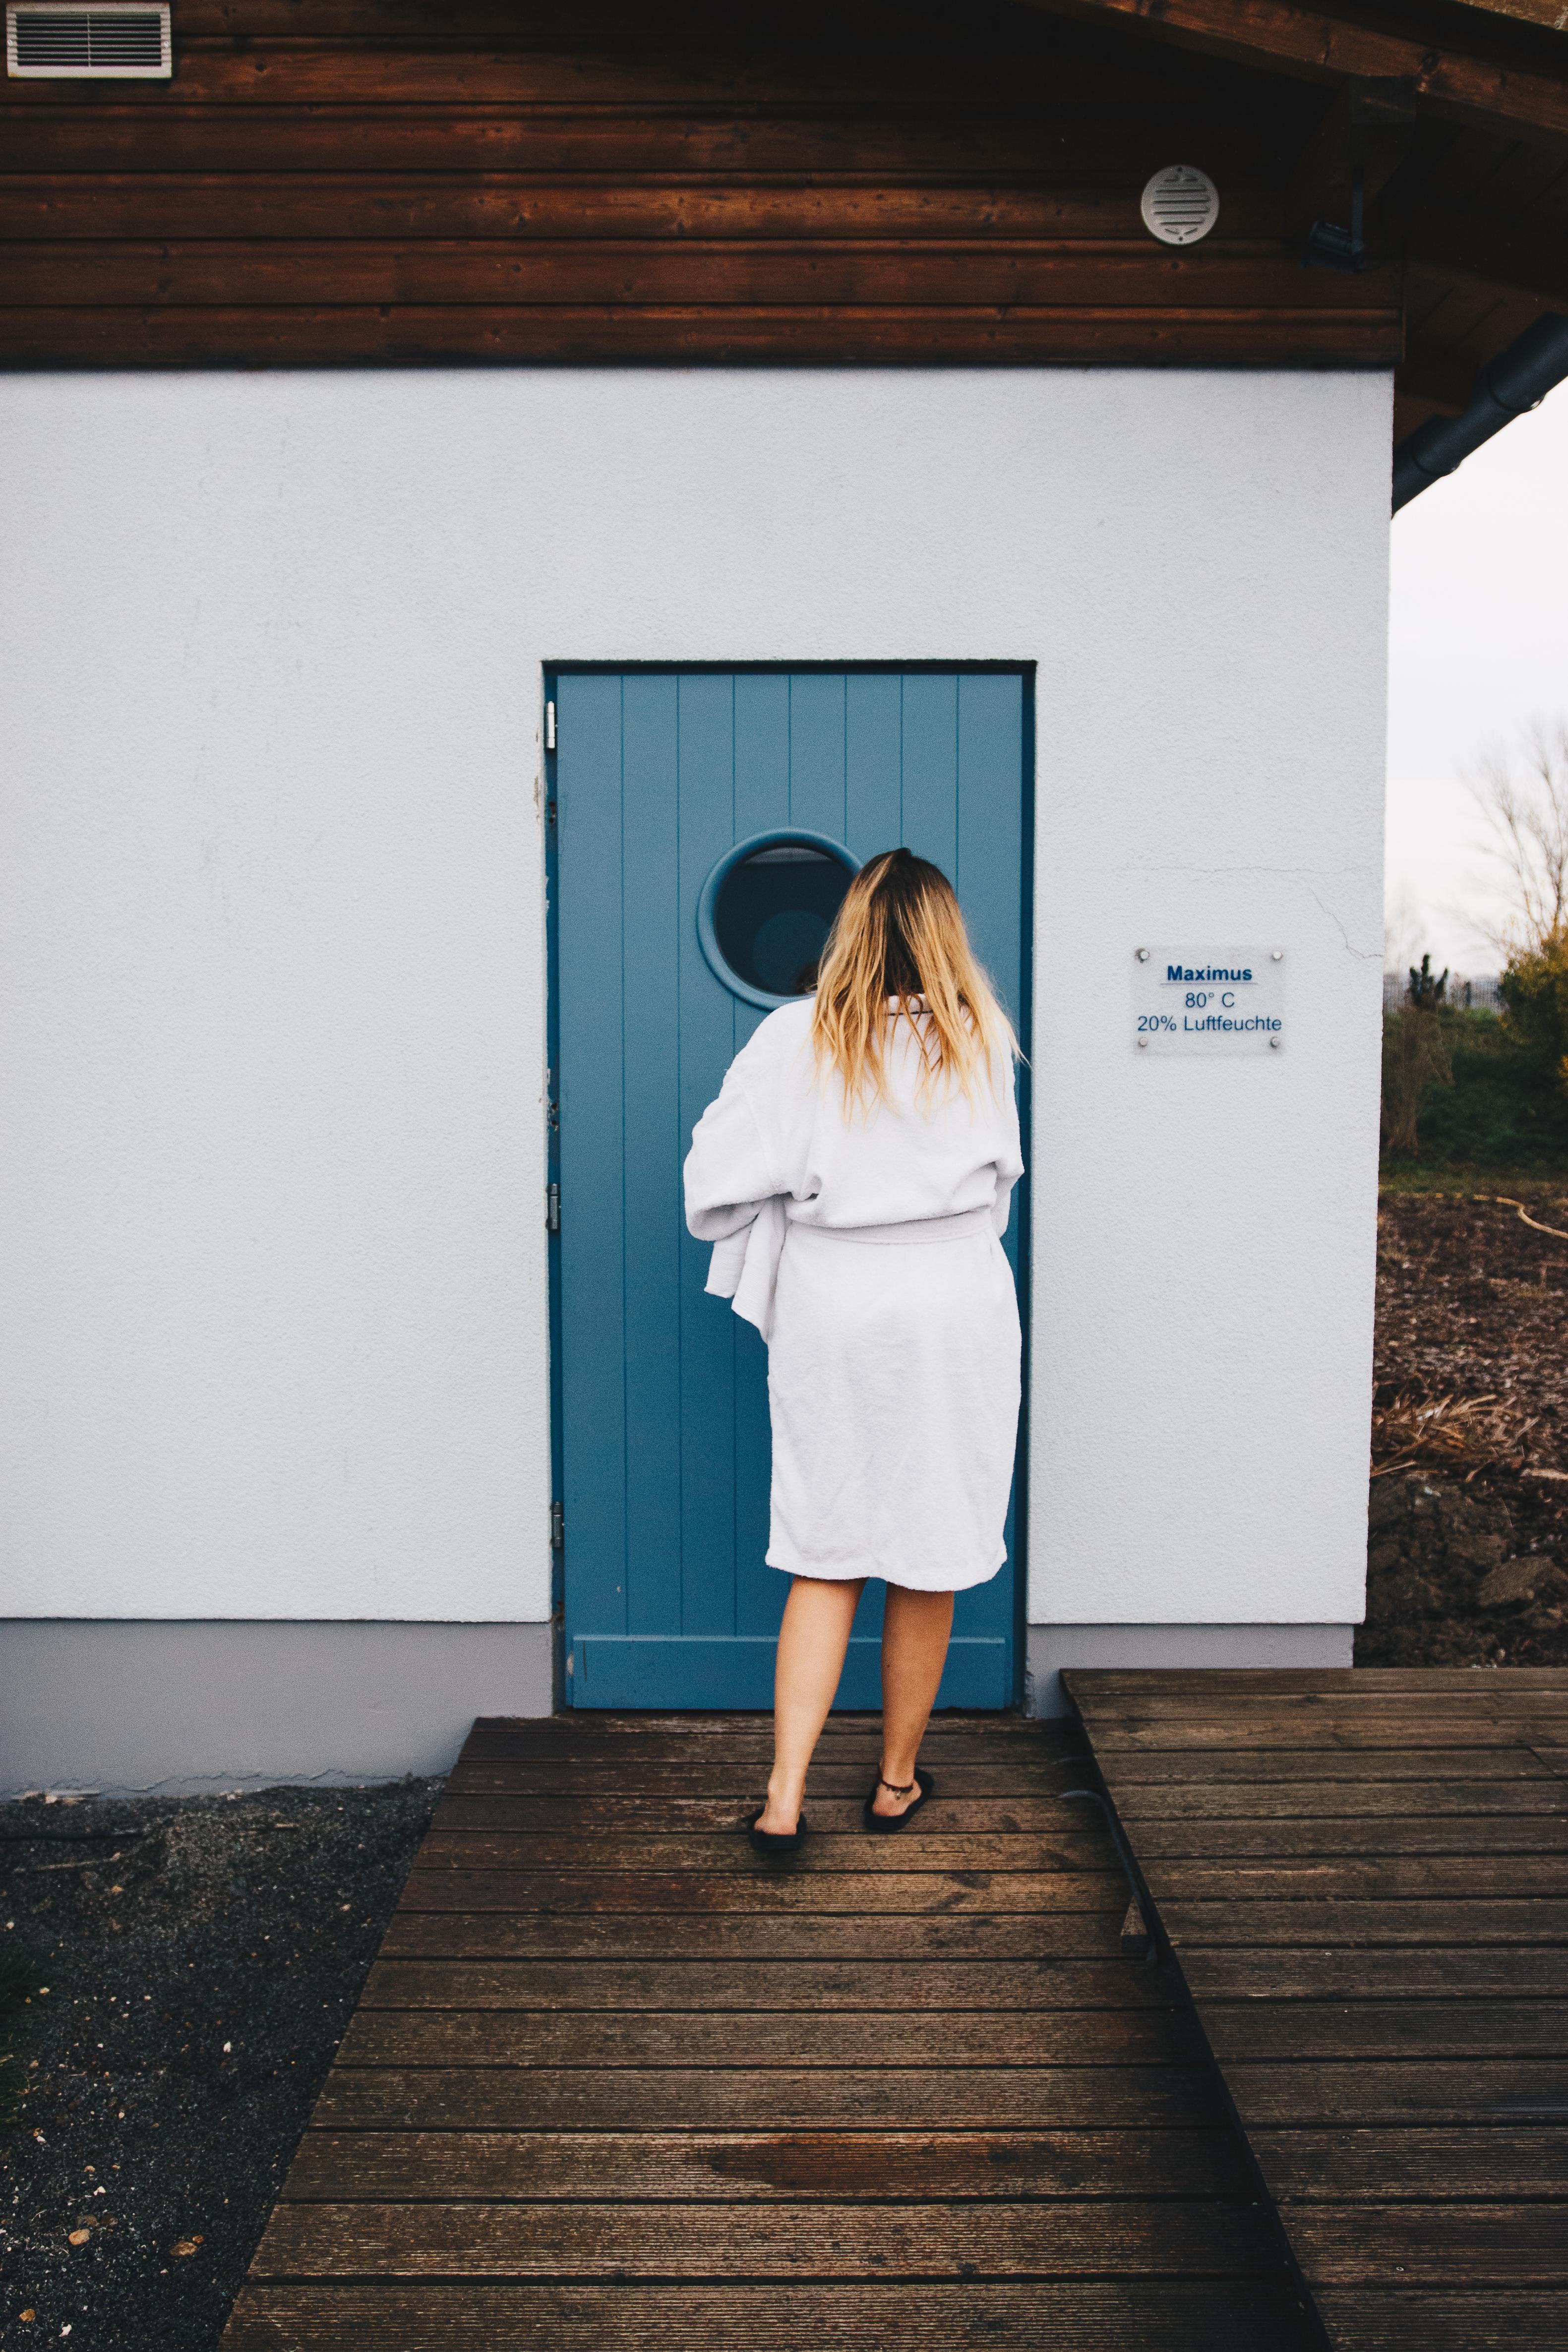 meri sauna-annabelle sagt-leipzig22